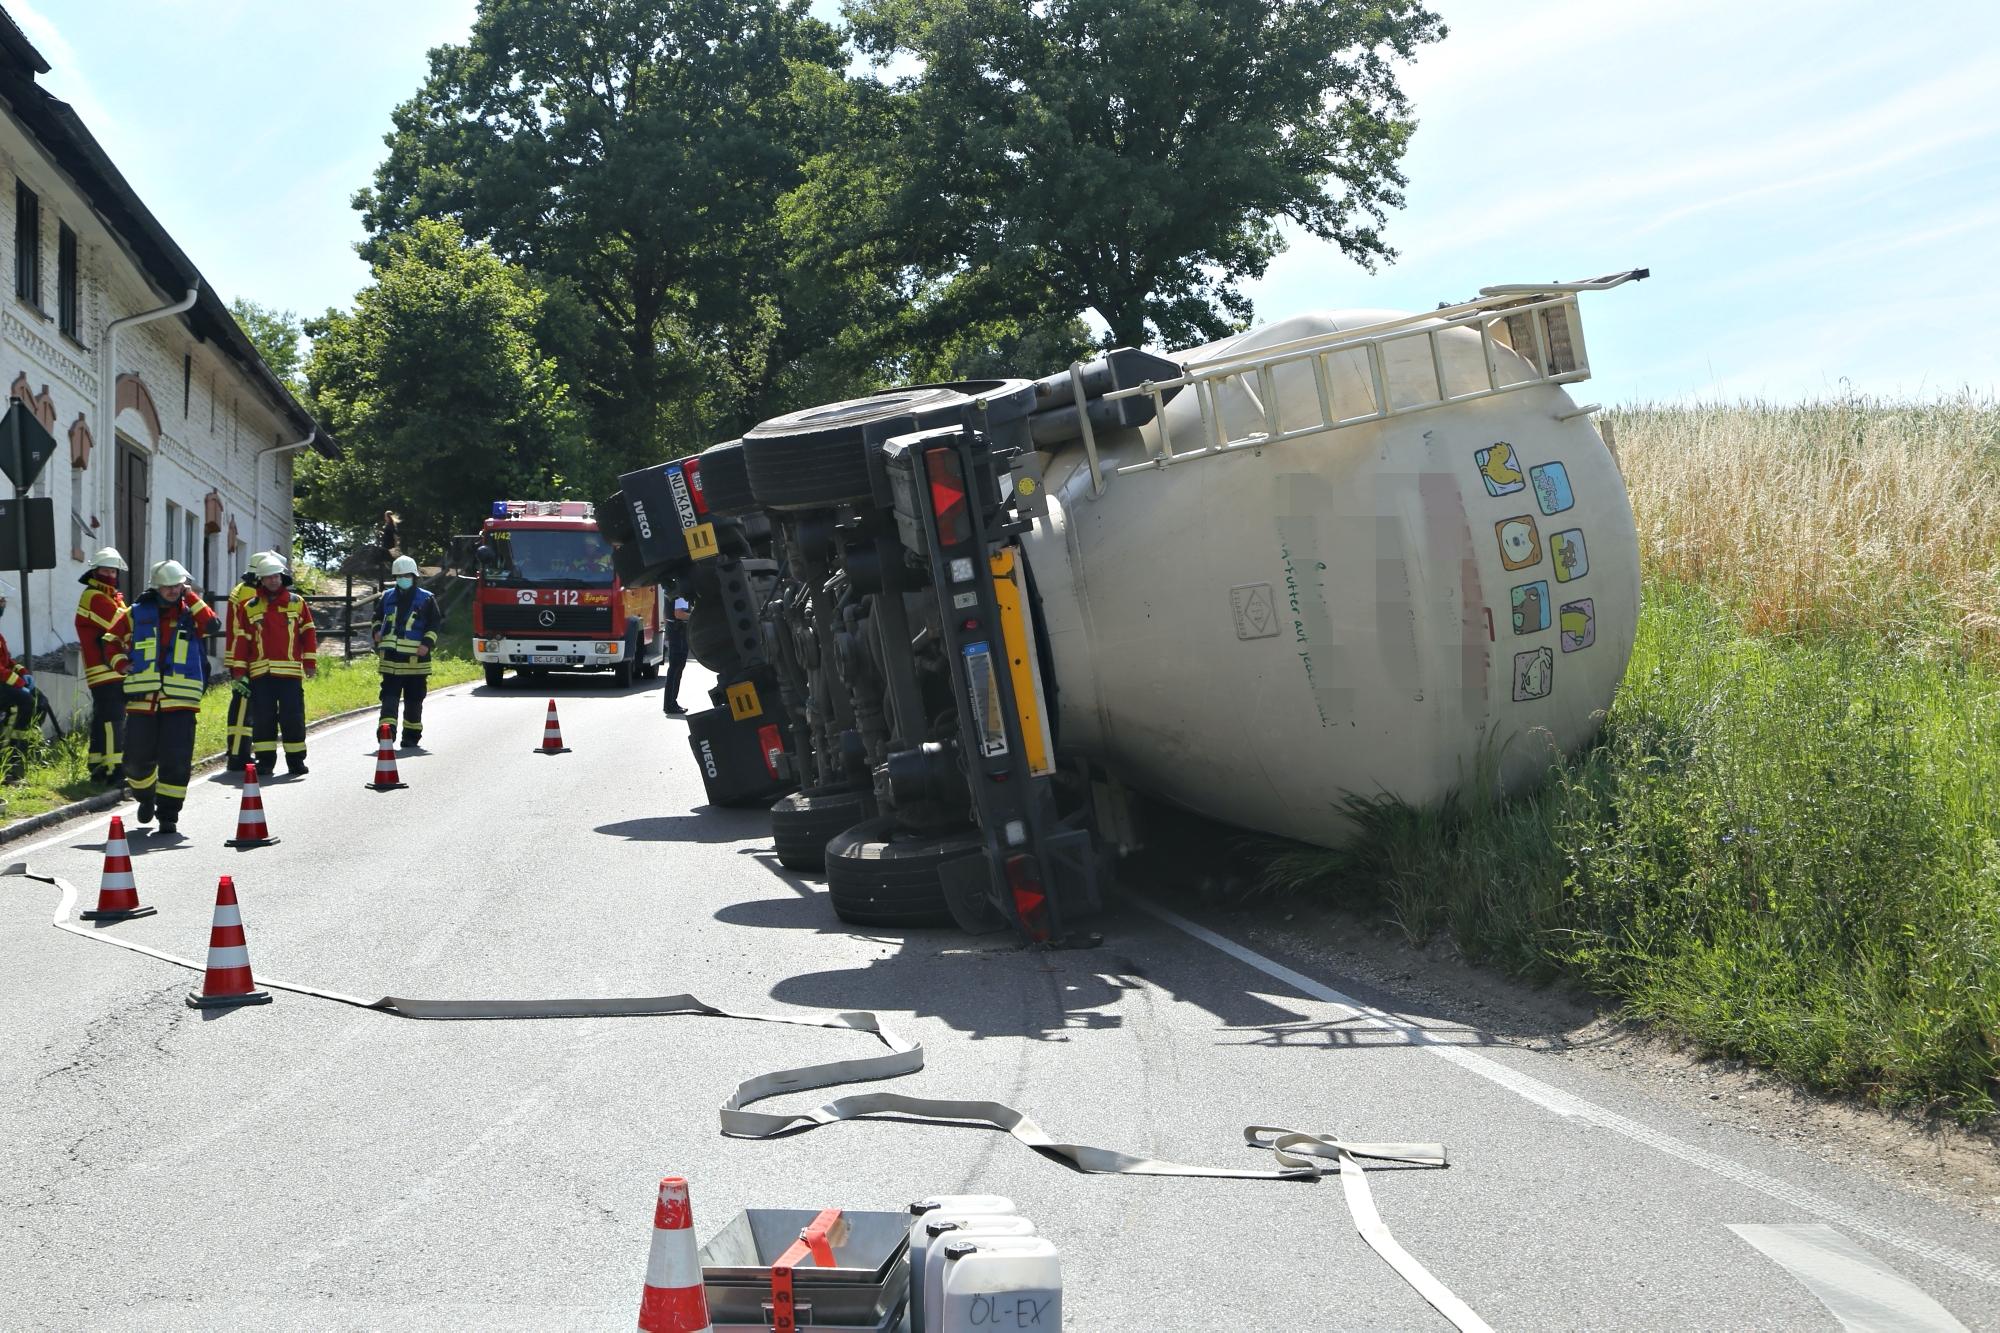 2020-07-13_B312_Edenbachen_Lkw-Unfall_Silozug_Feuerwehr_Kutter_pel_IMG_7188